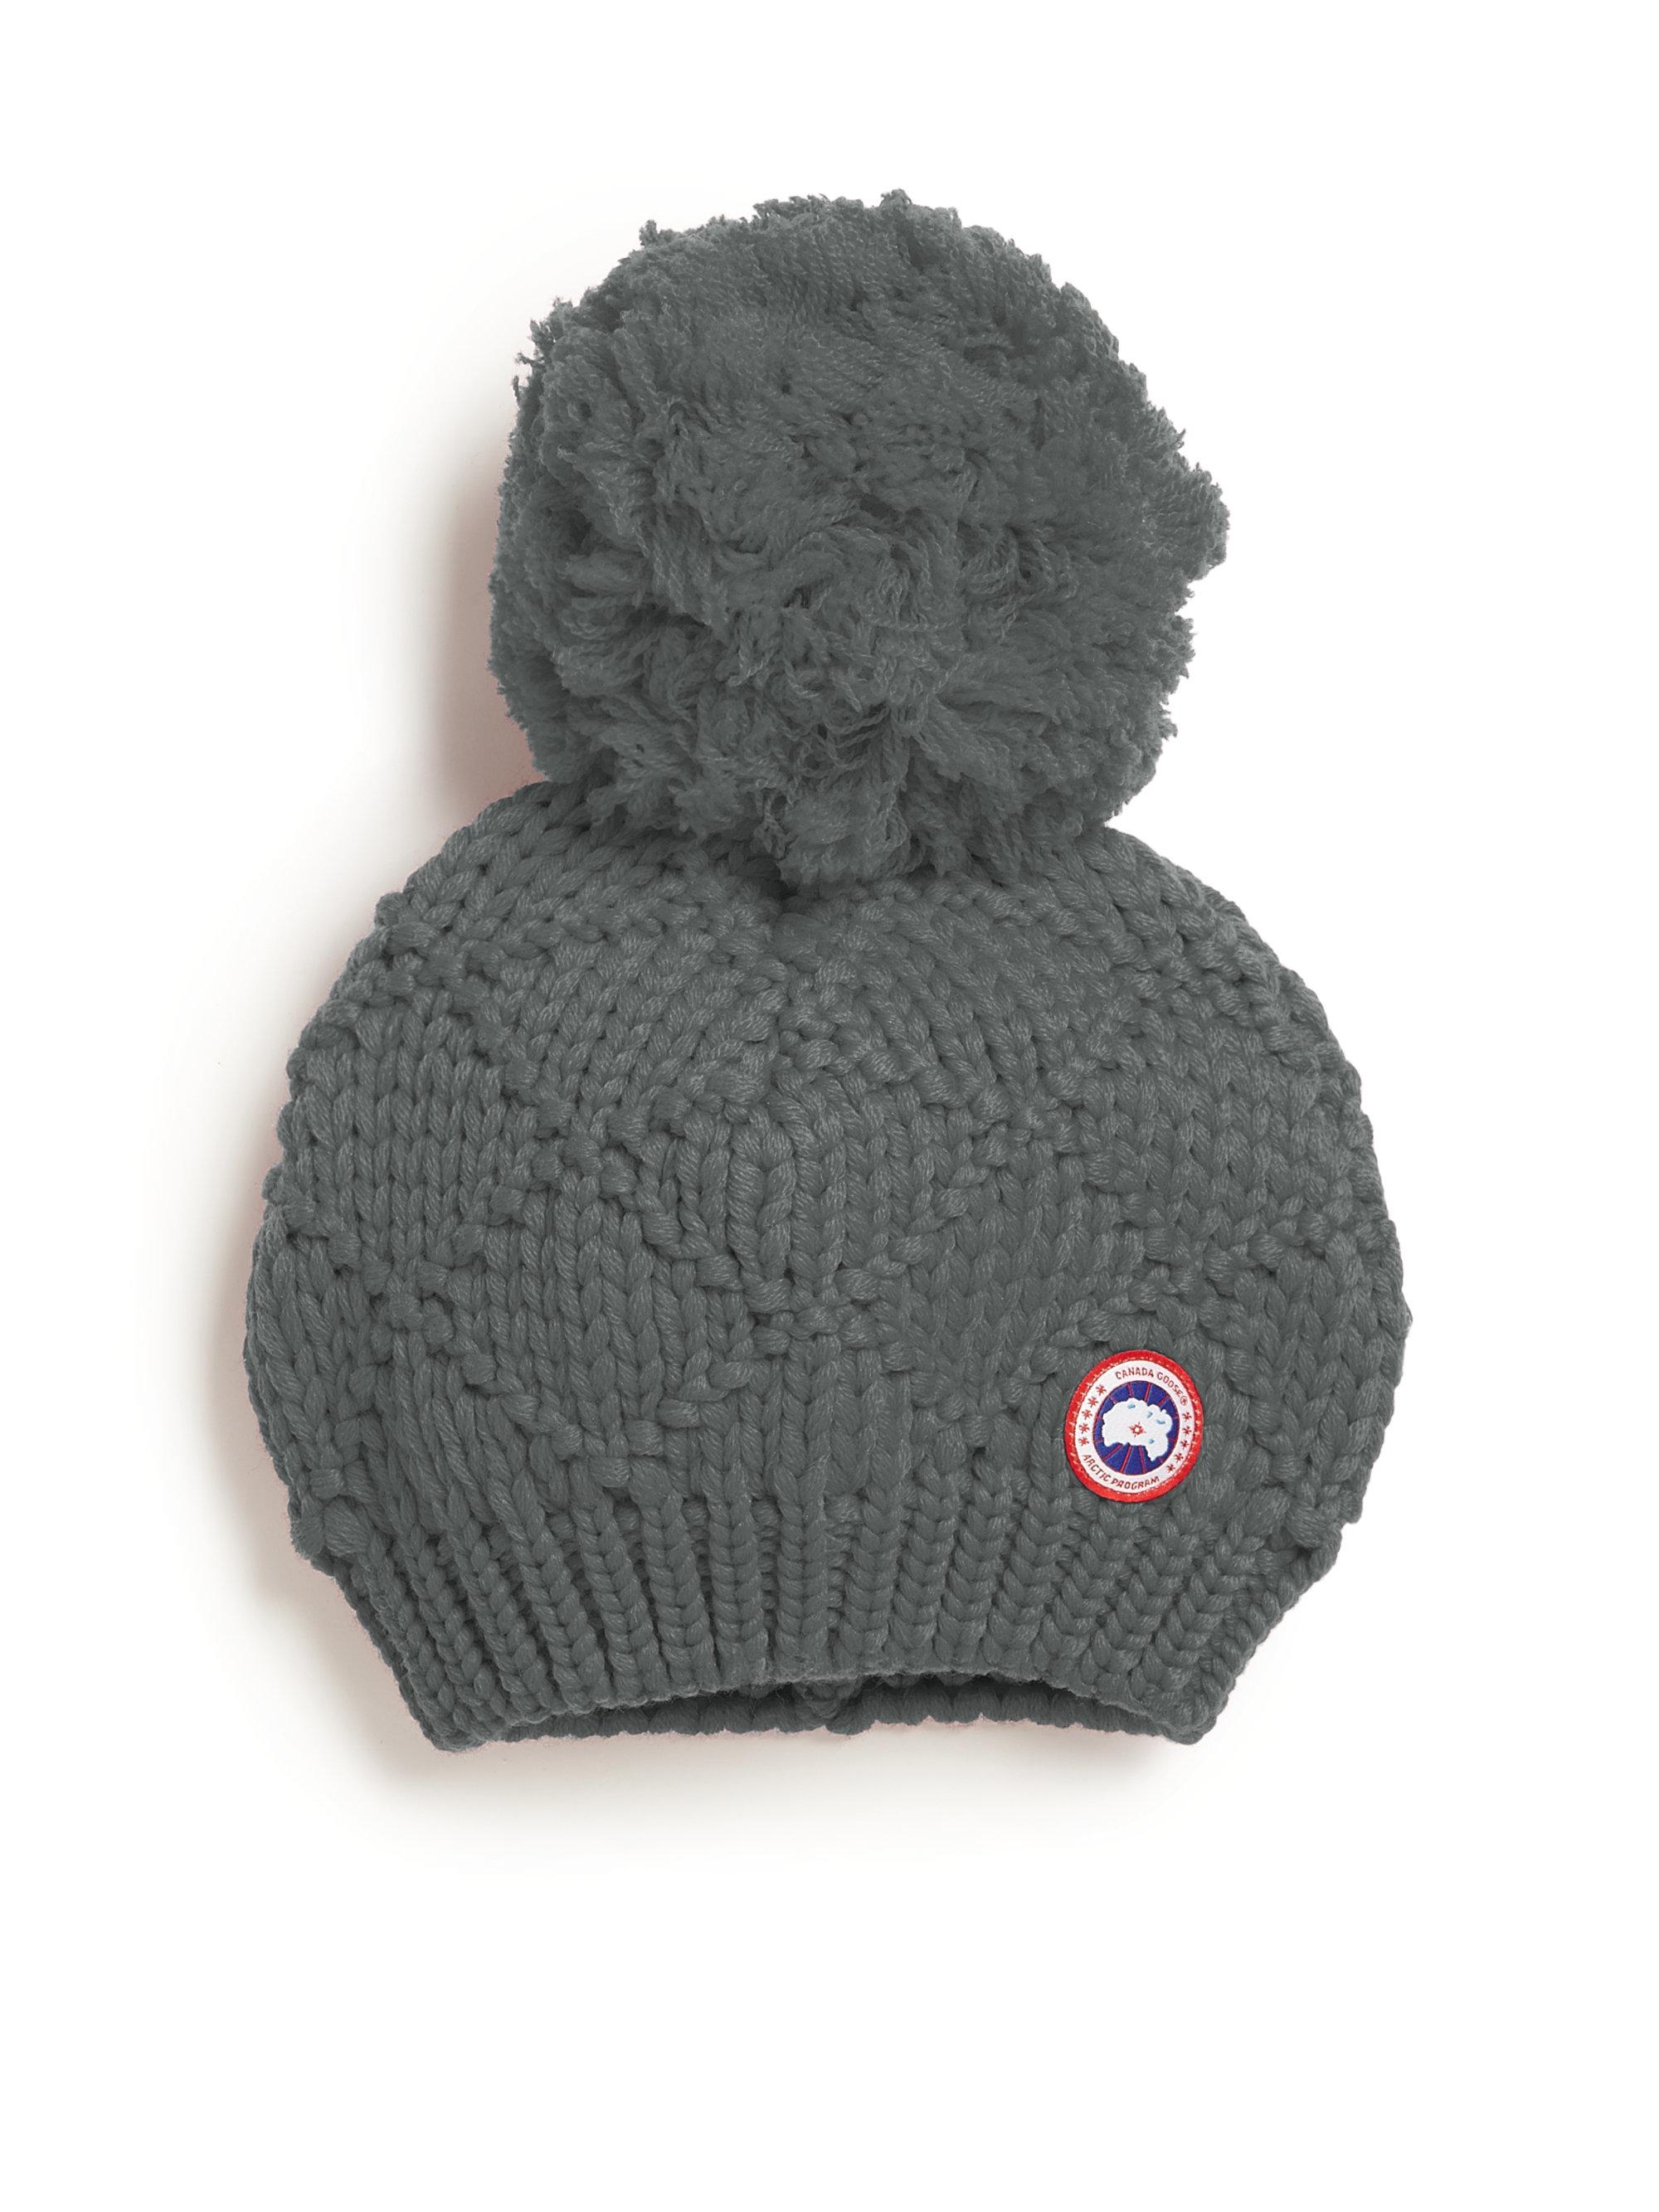 237d509f3dd canada goose hat with fur pom pom